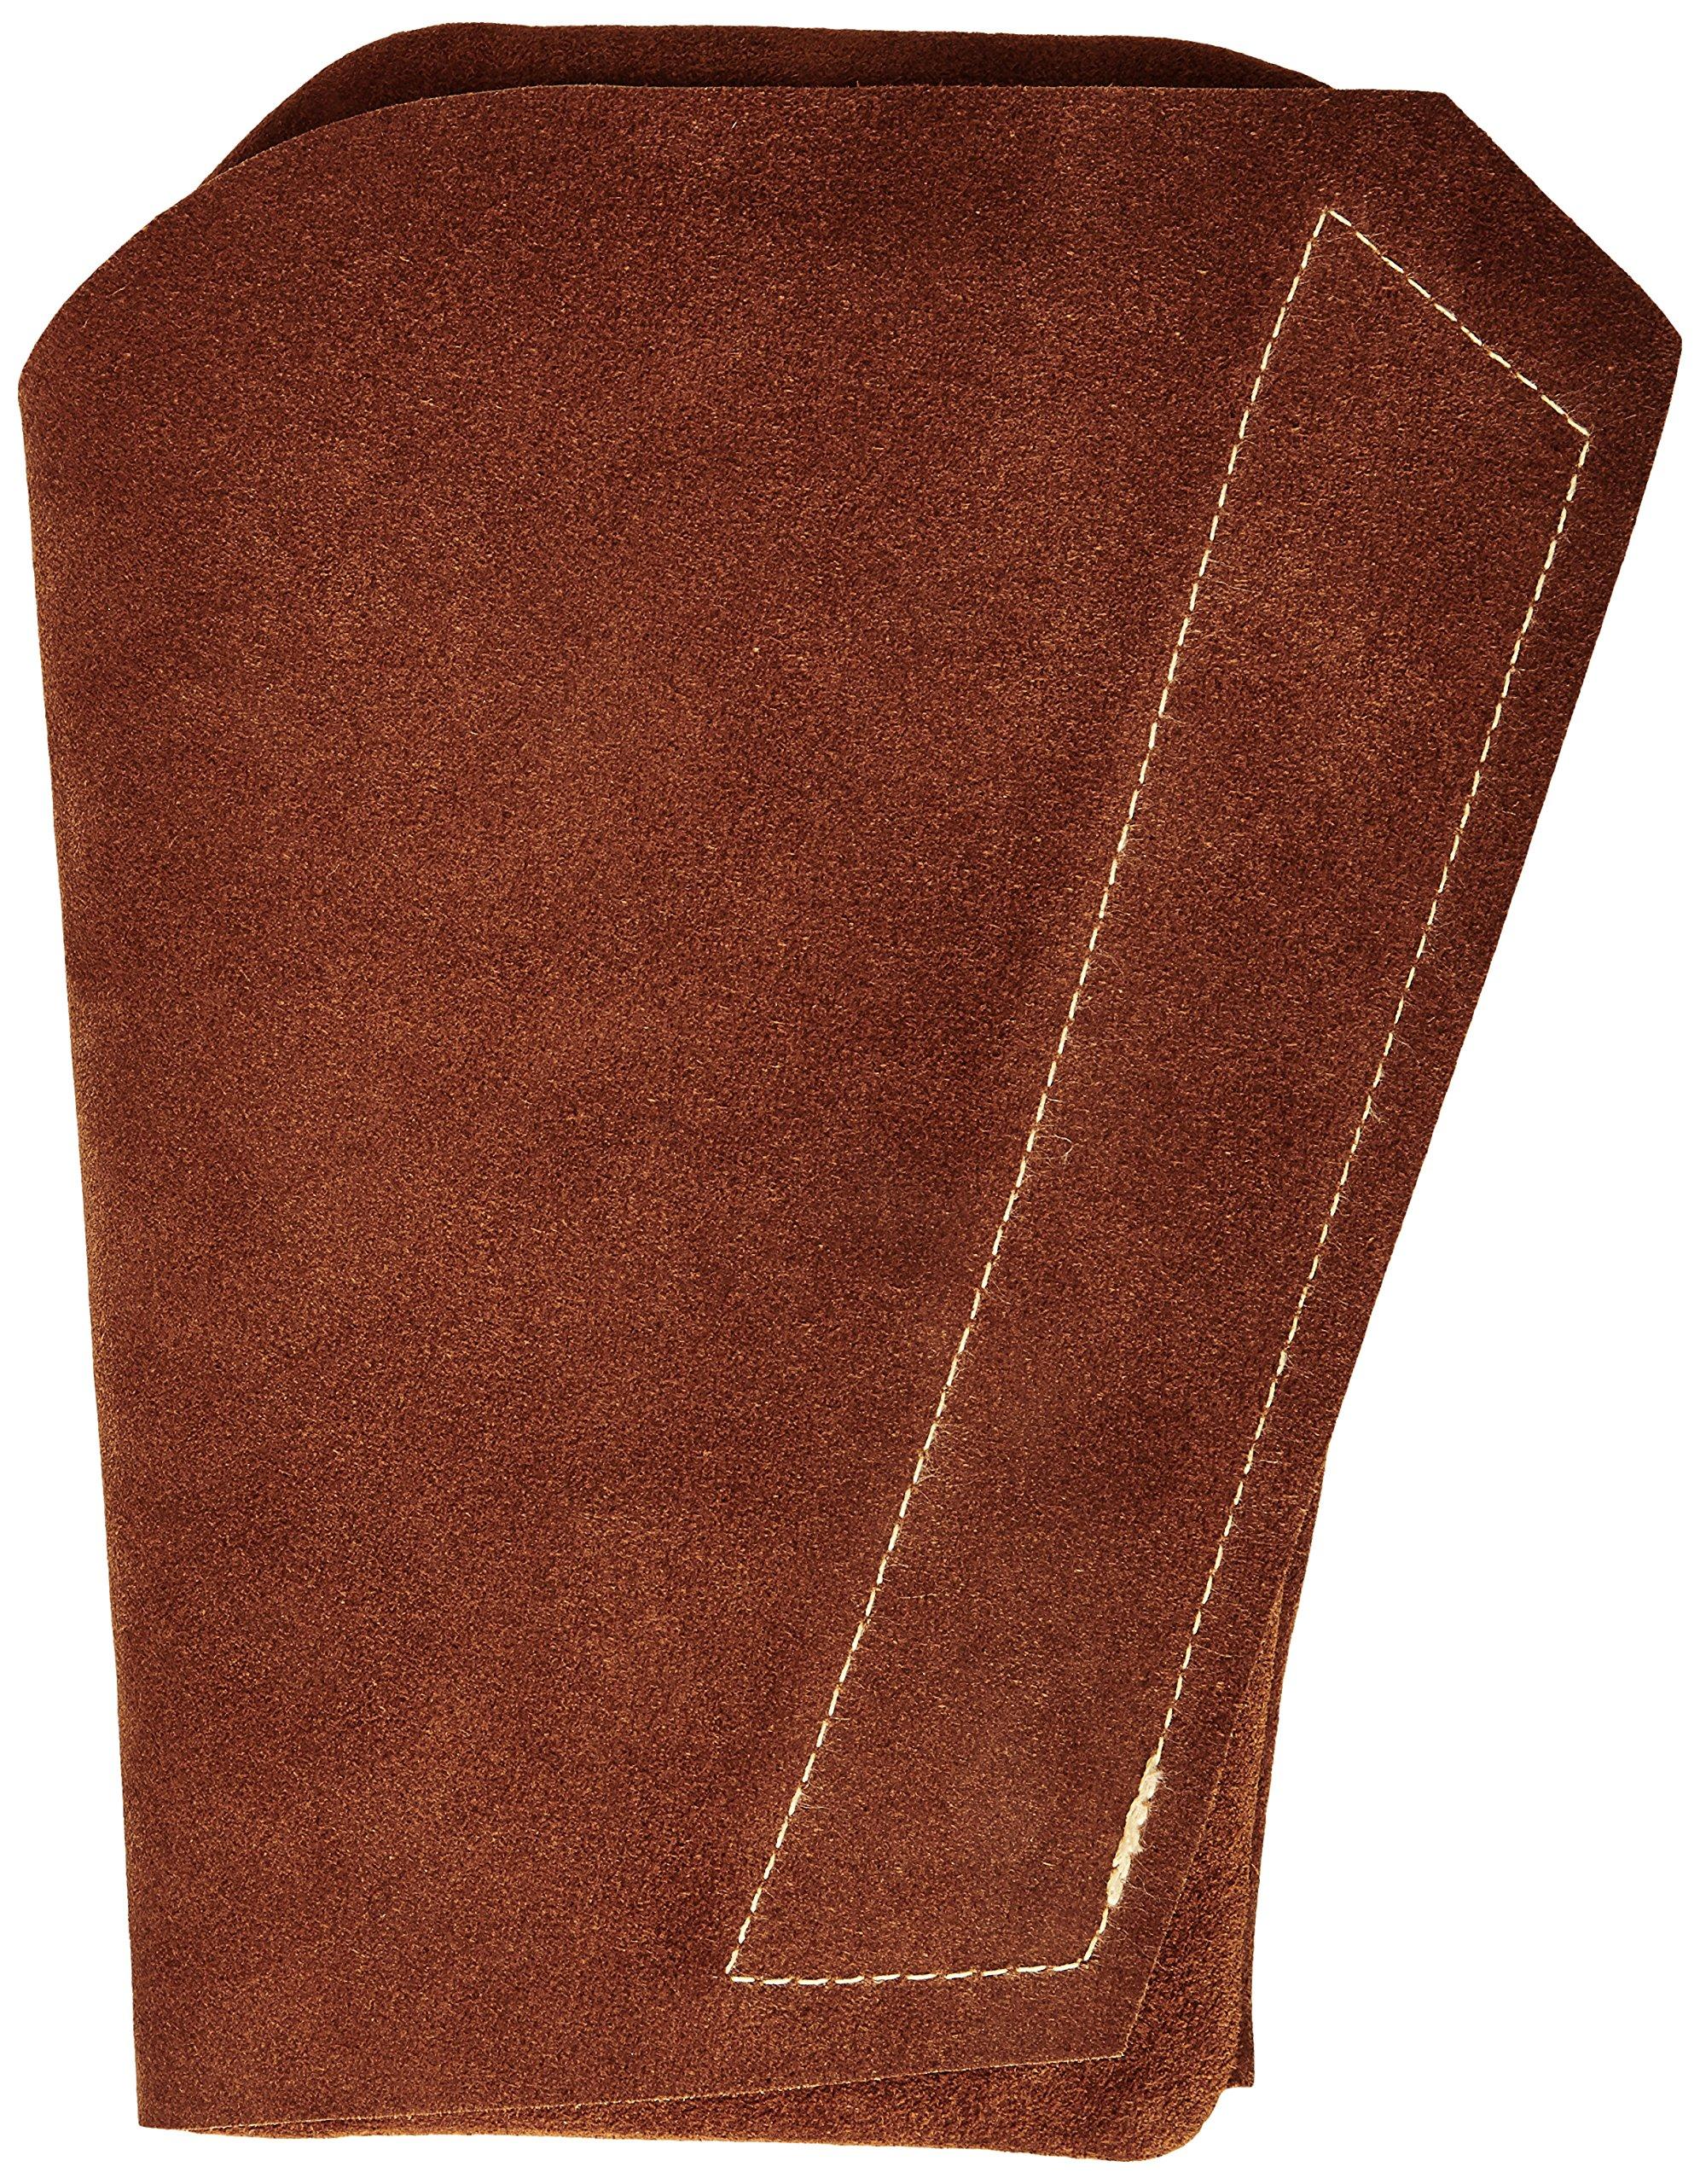 Lapco Lap-AL Leather Arm Pad, Left Arm, One Size, Tan by LAPCOFR